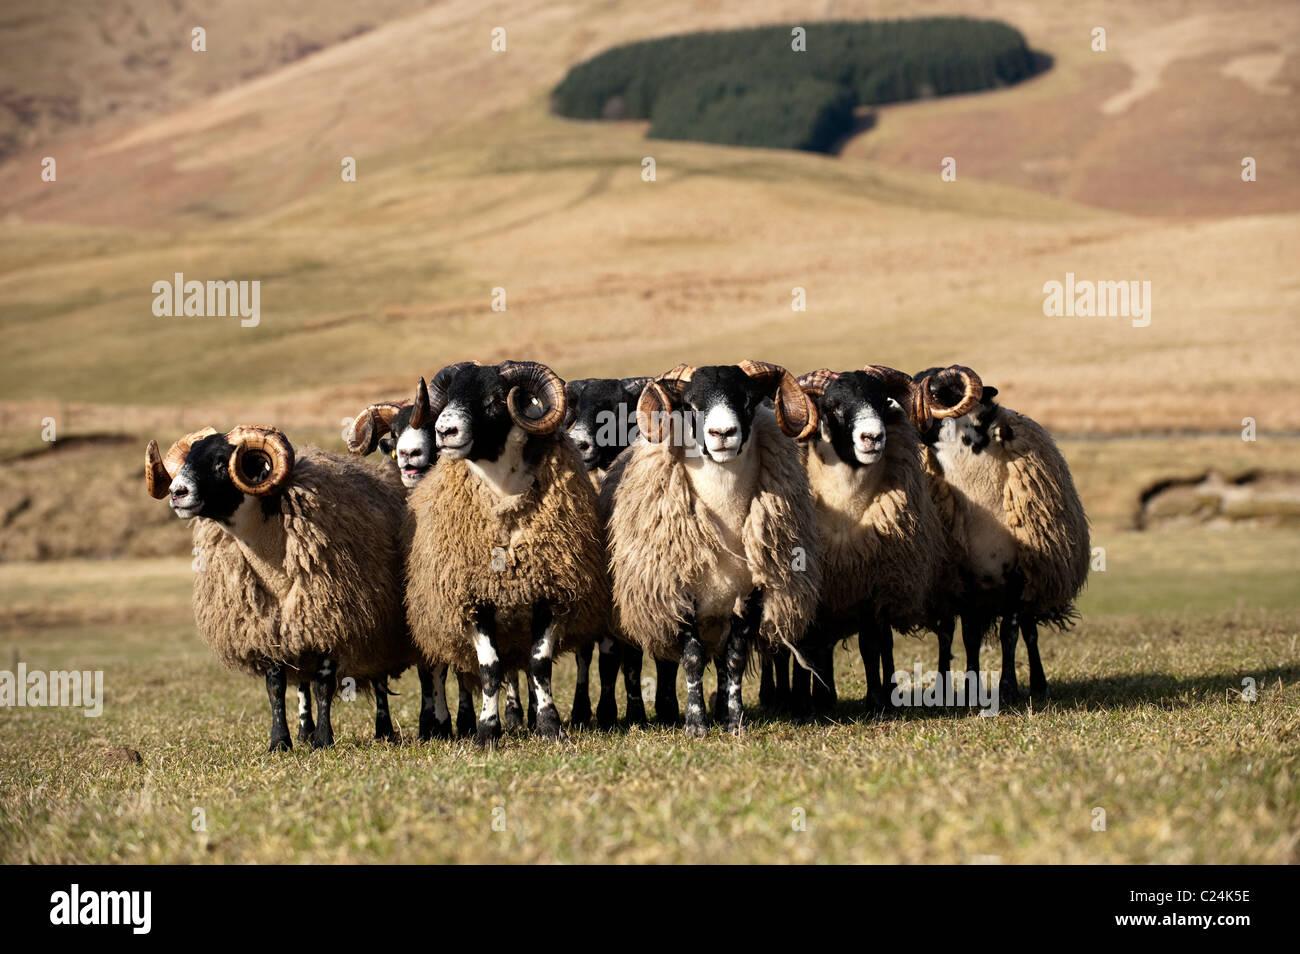 Scottish Blackface yearling rams in pasture. - Stock Image